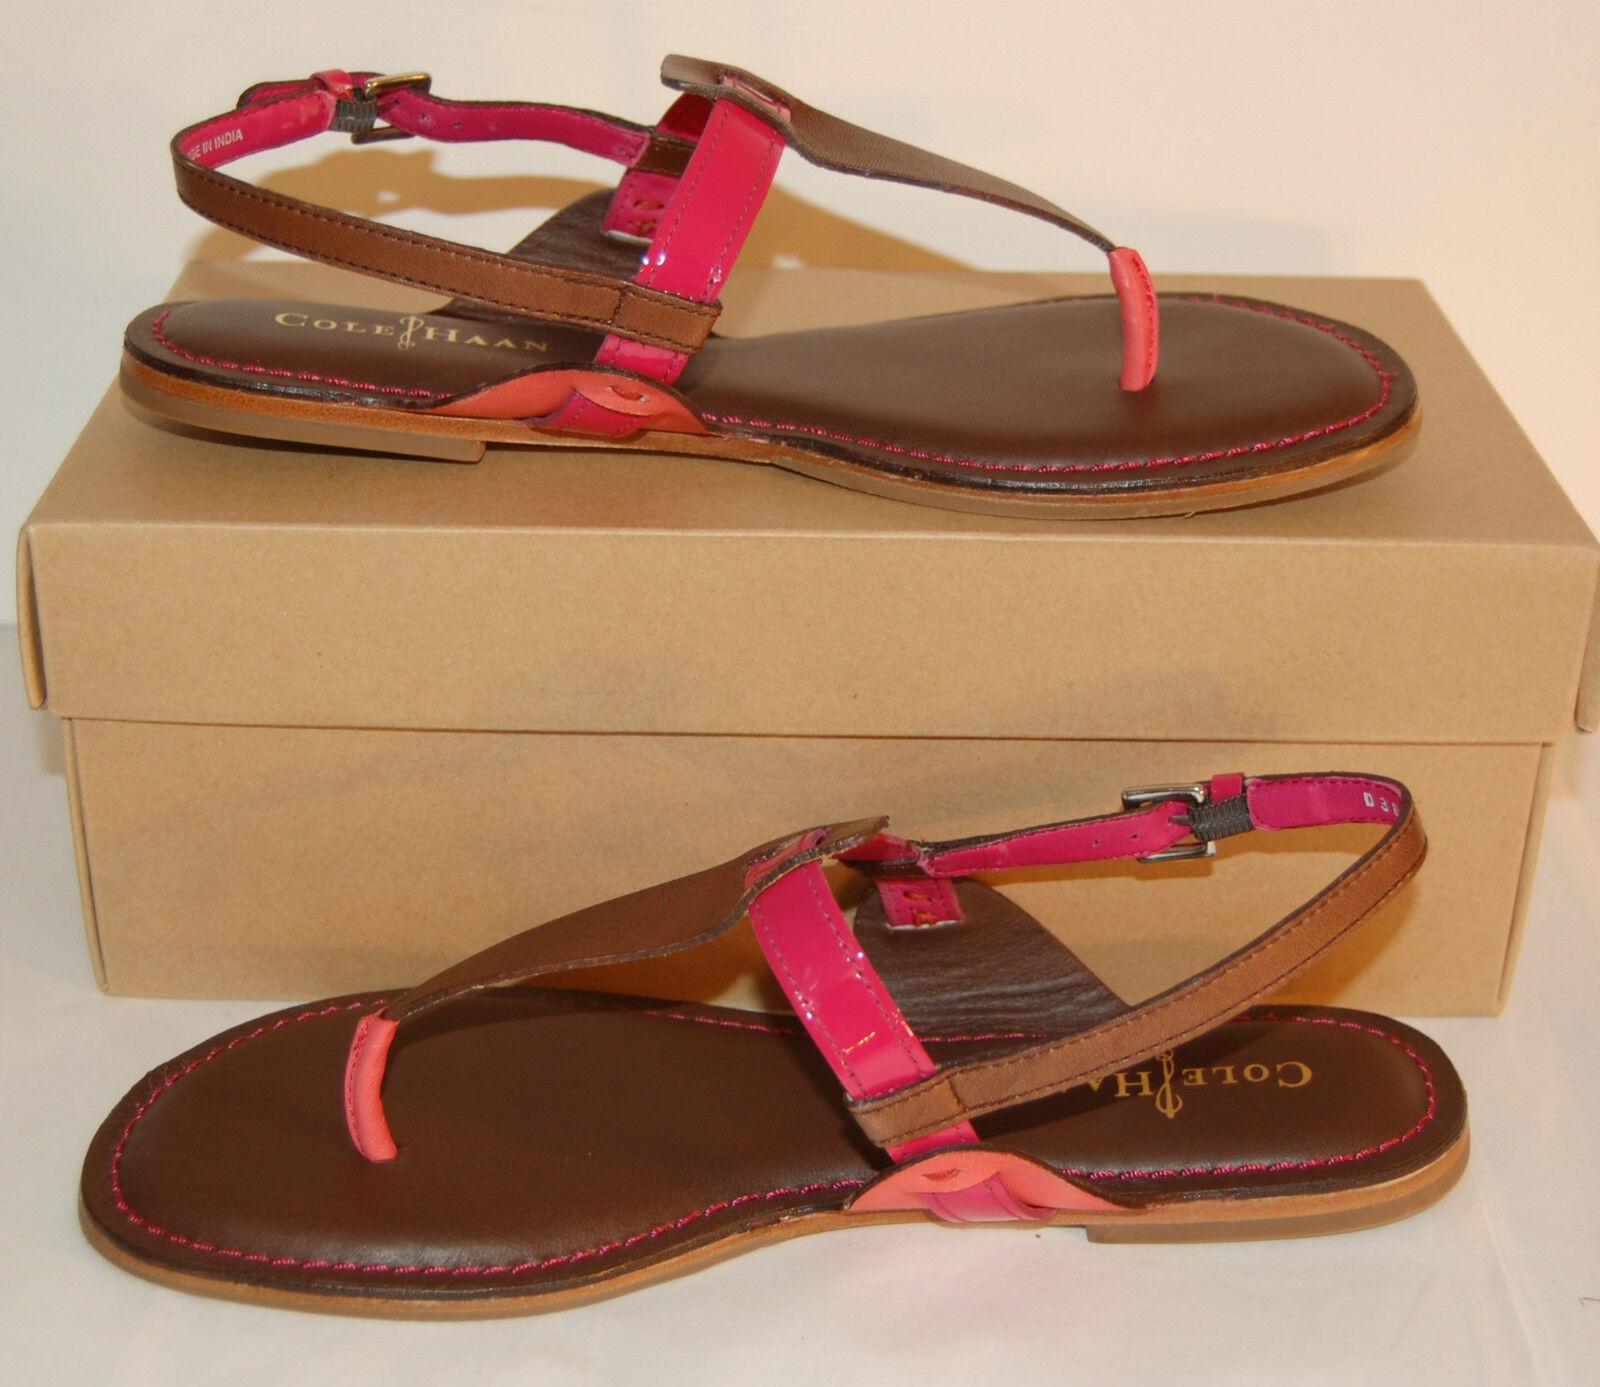 New 158 8.5 Cole Haan Bridget Thong 8.5 158 B Sandale Strap Chestnut Braun Pink Shrimp 88bfa8